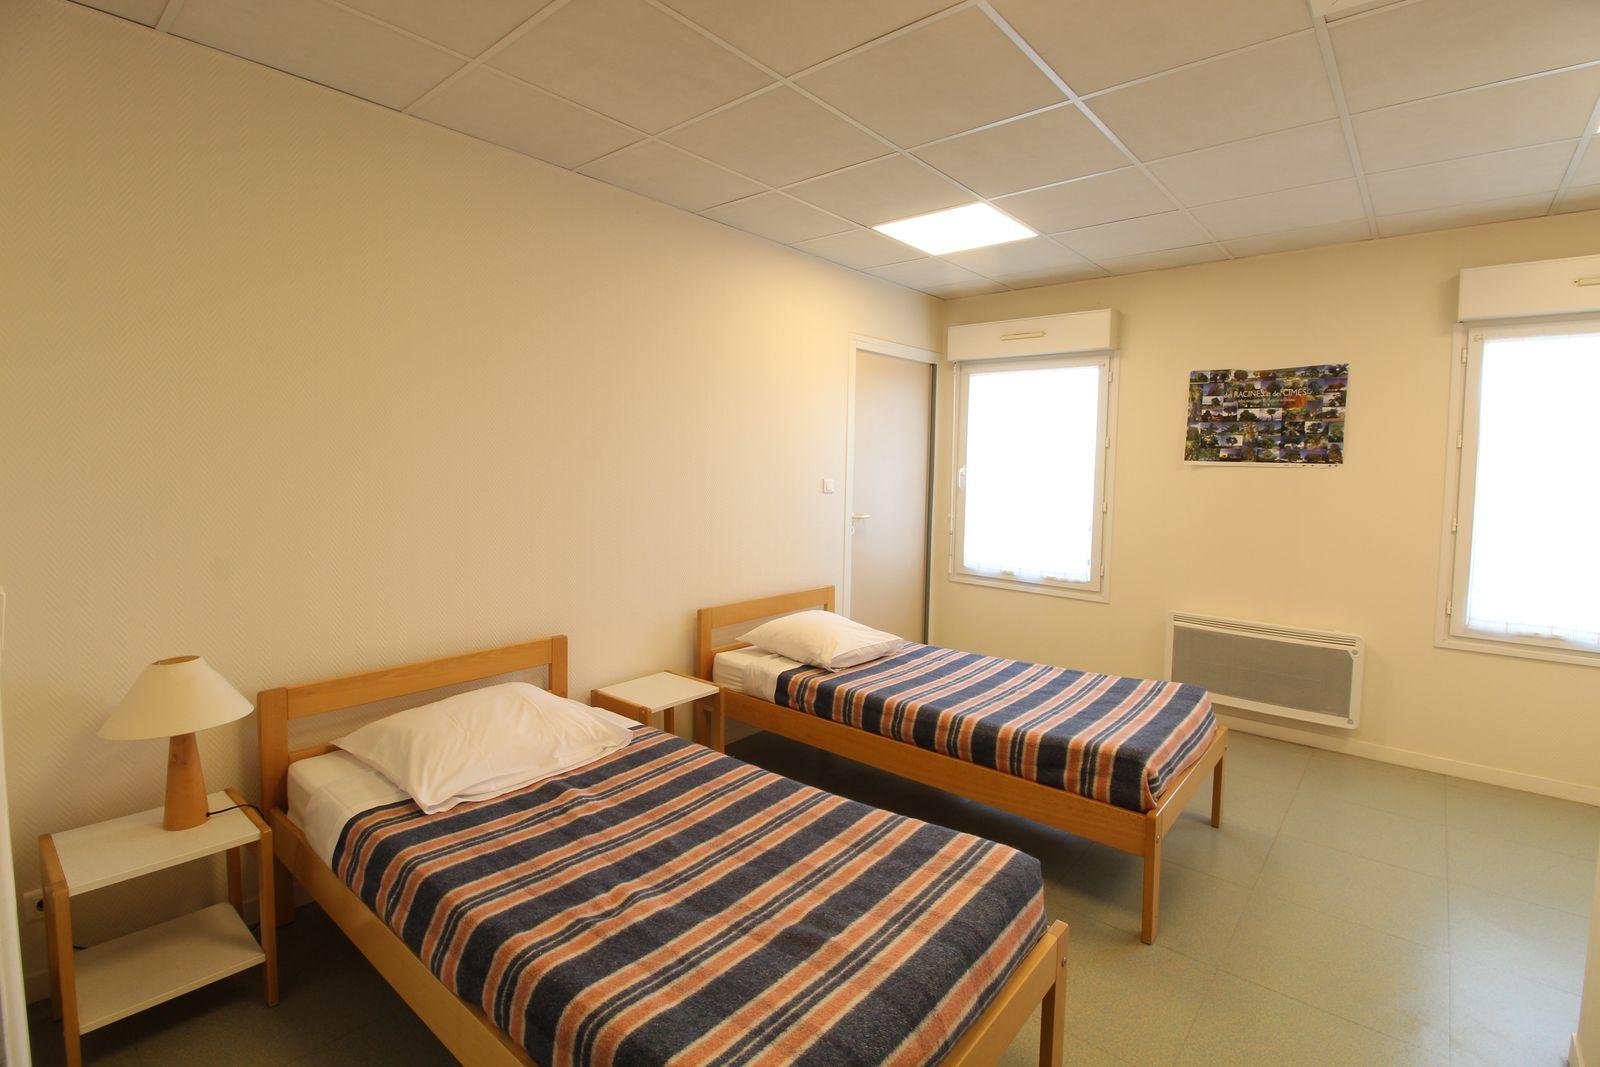 Chambre n°4 : 2 lits 1er étage